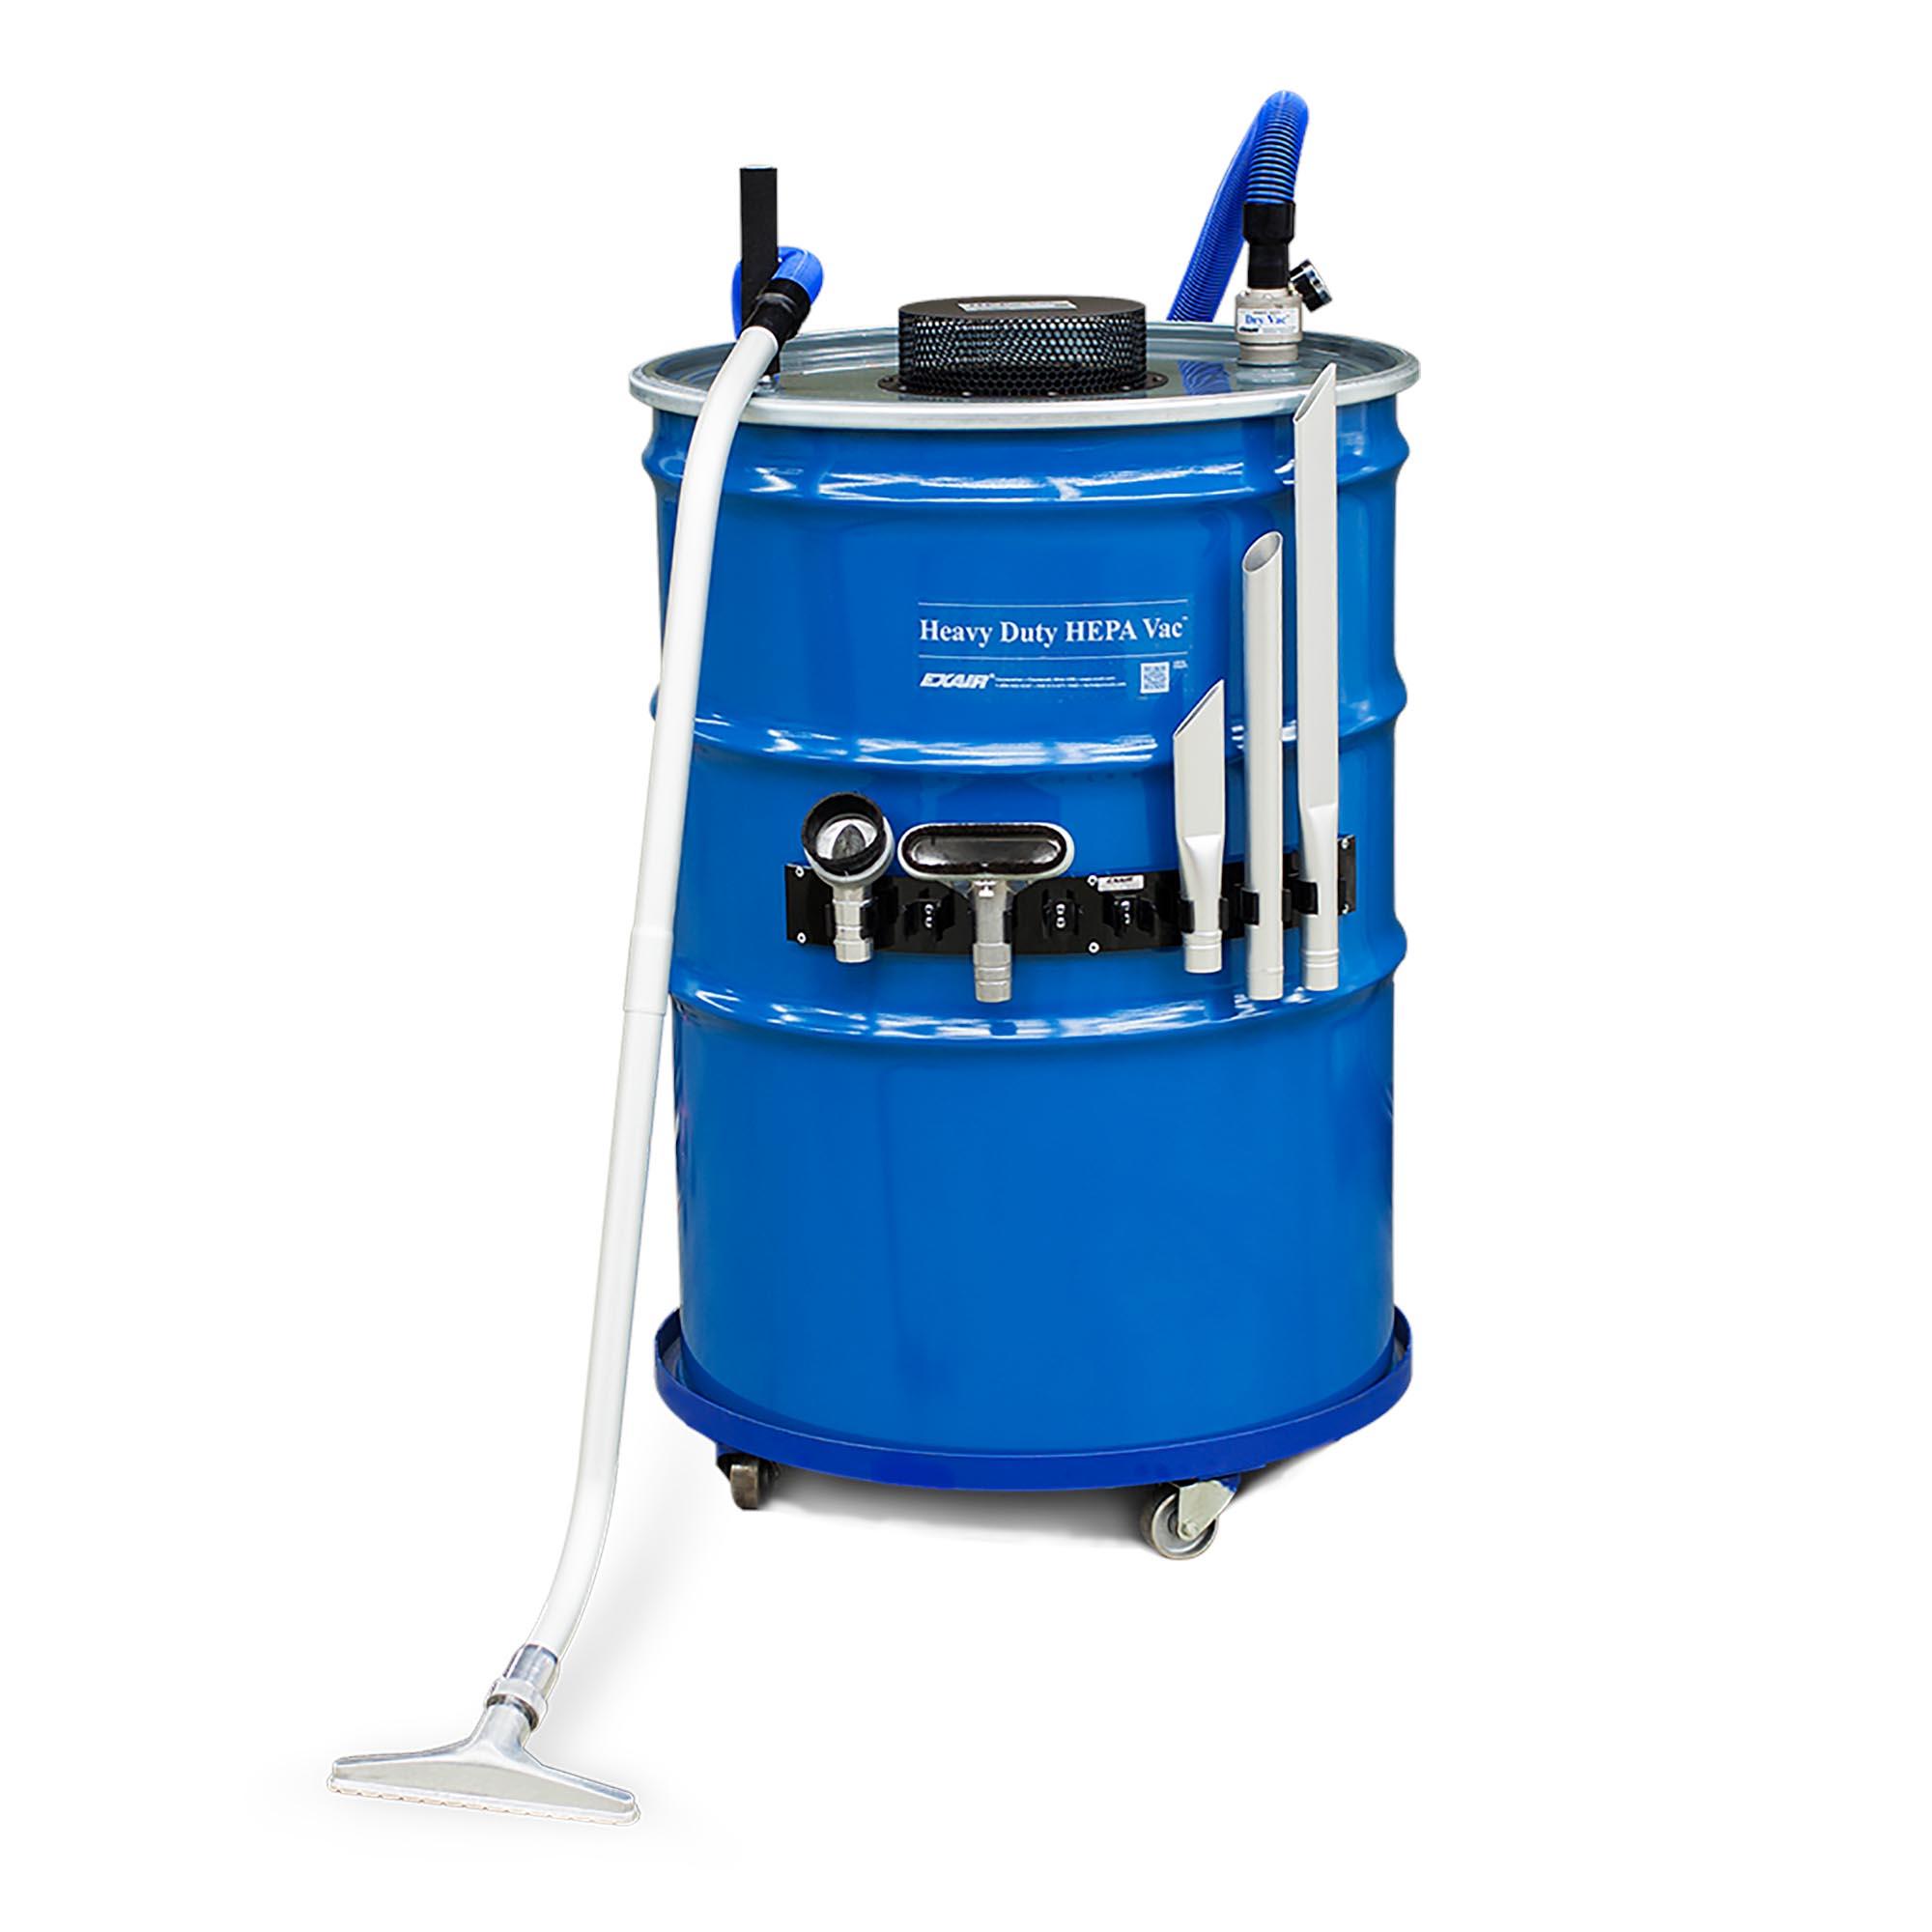 Model 6399-110 110 Gallon Premium Heavy Duty HEPA Vac System